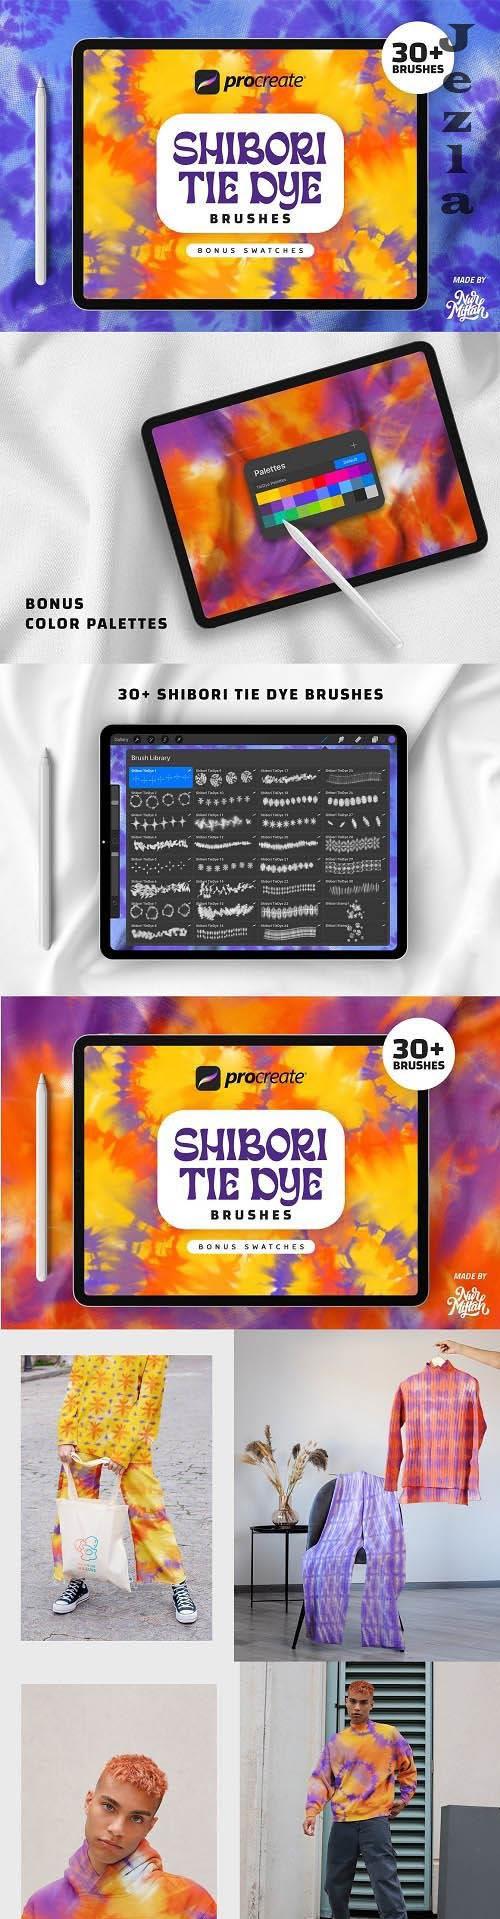 Procreate Shibori Tie Dye Brushes - 6280242